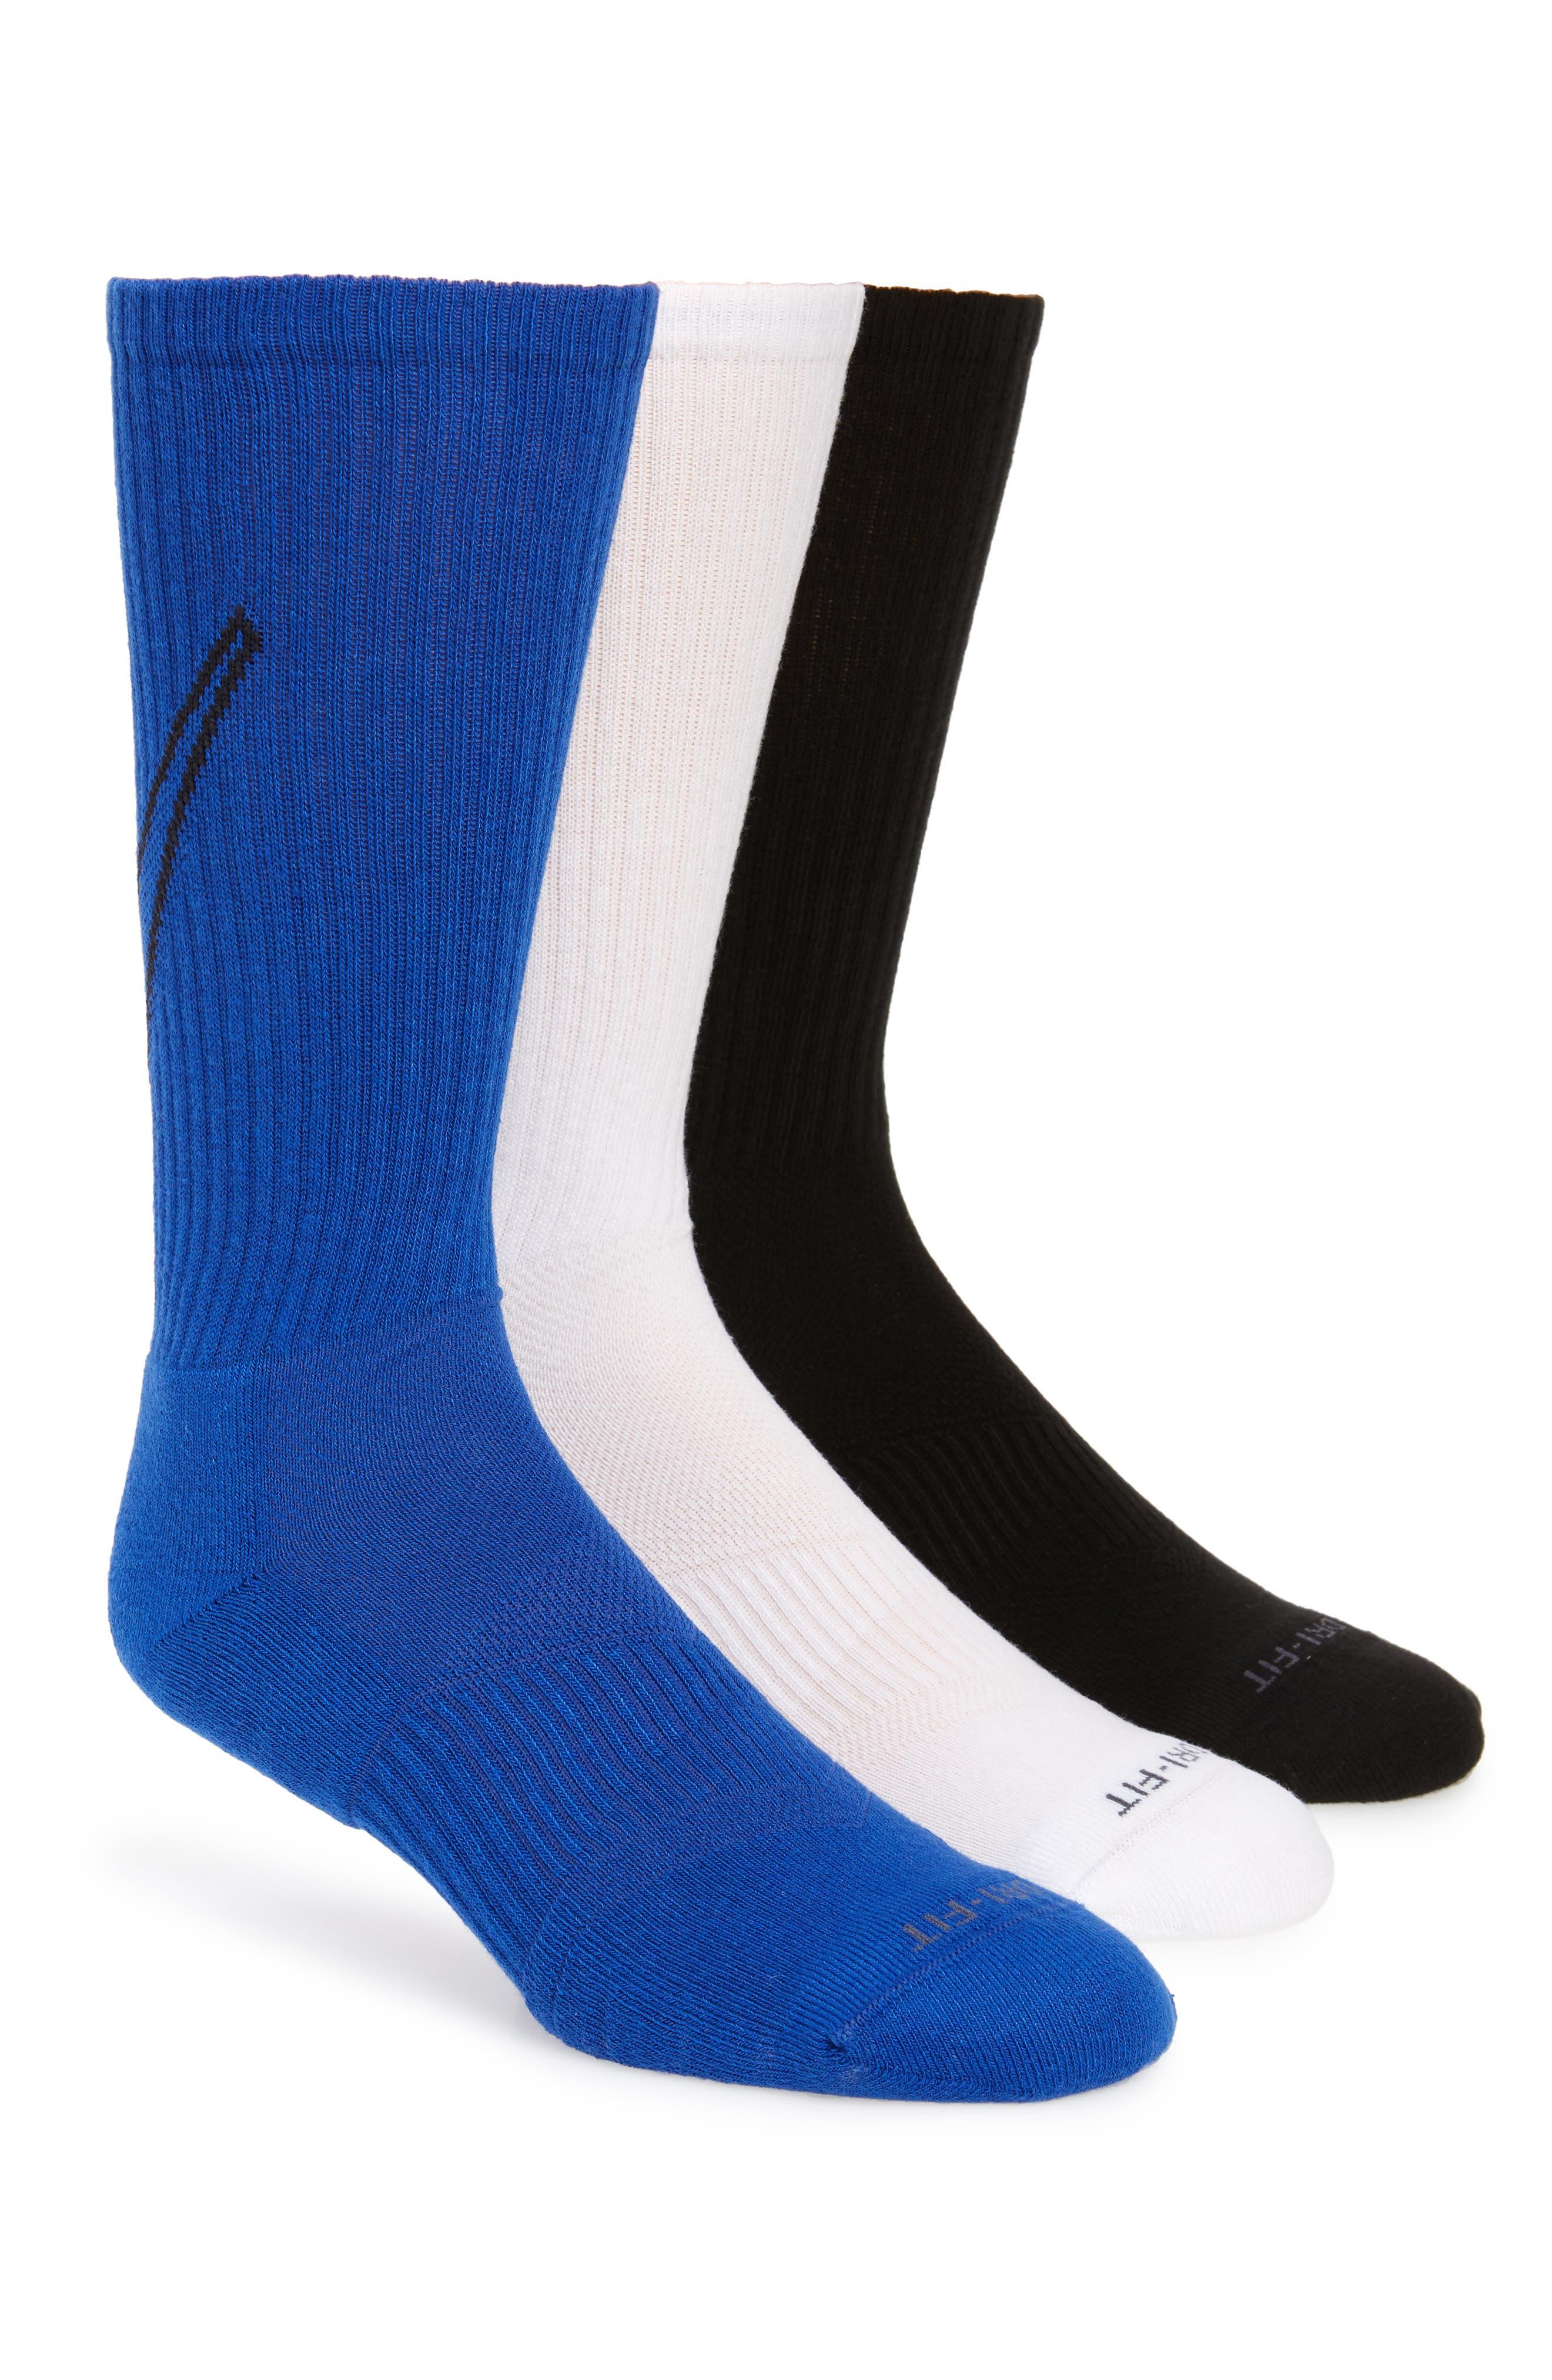 NIKE Everyday Max Cushion 3-Pack Crew Socks, Main, color, 100